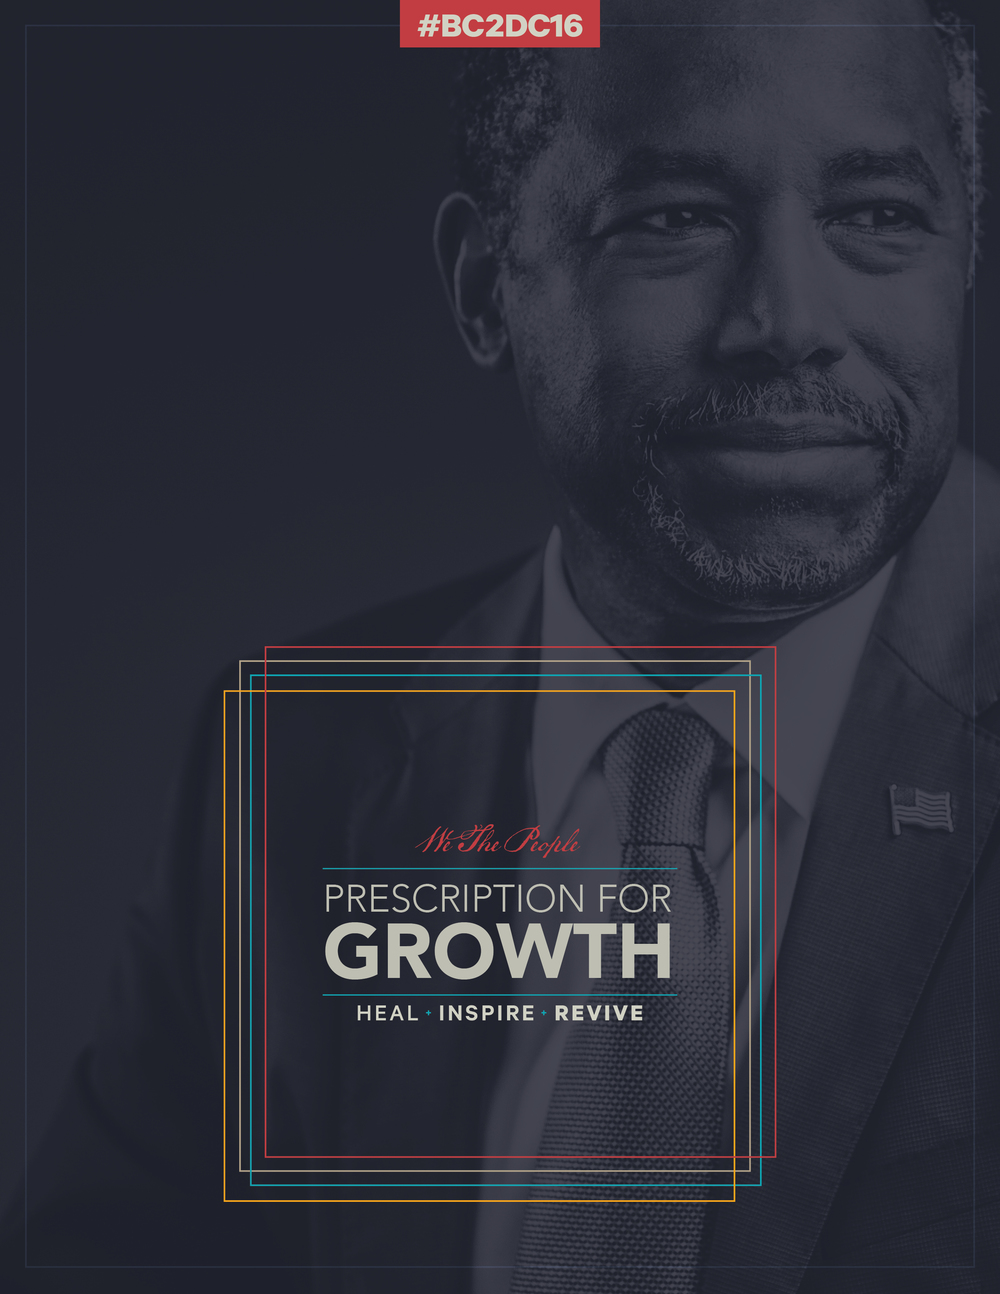 20160104_Prescription for Growth_posts_c5.jpg